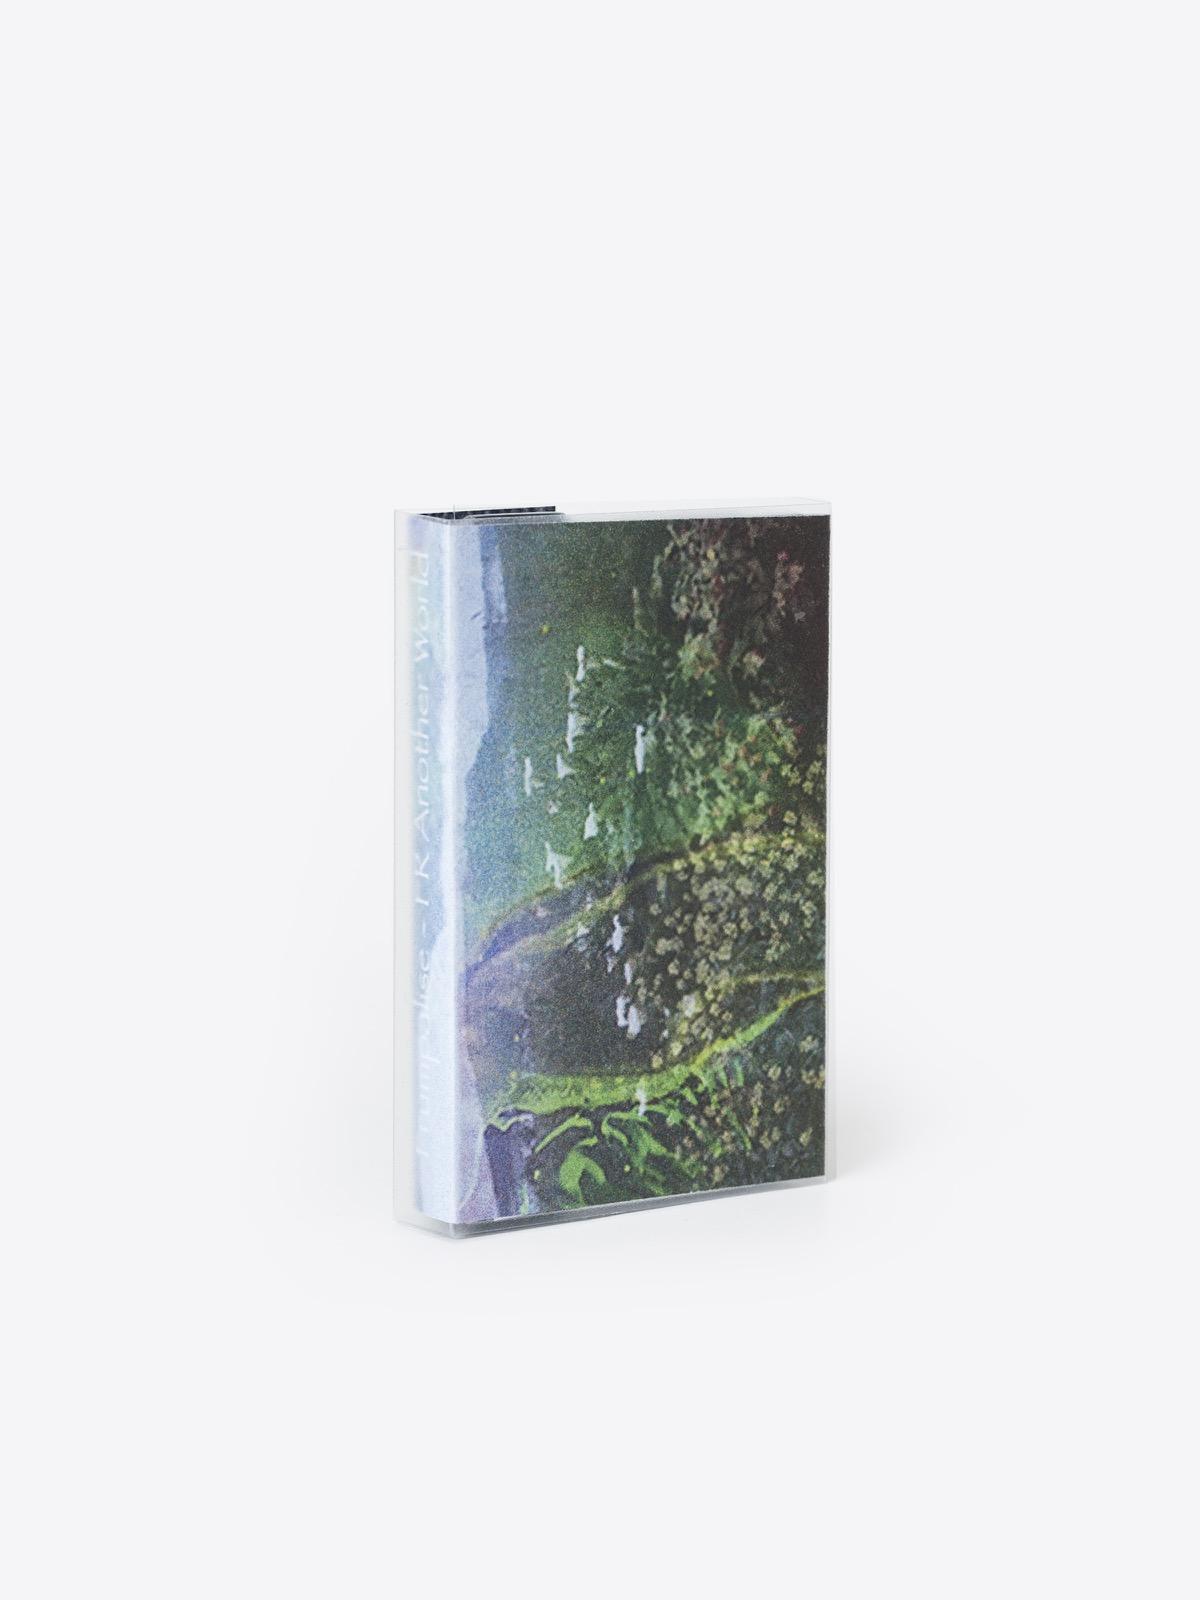 kashual plastik frumpalise - fr another world